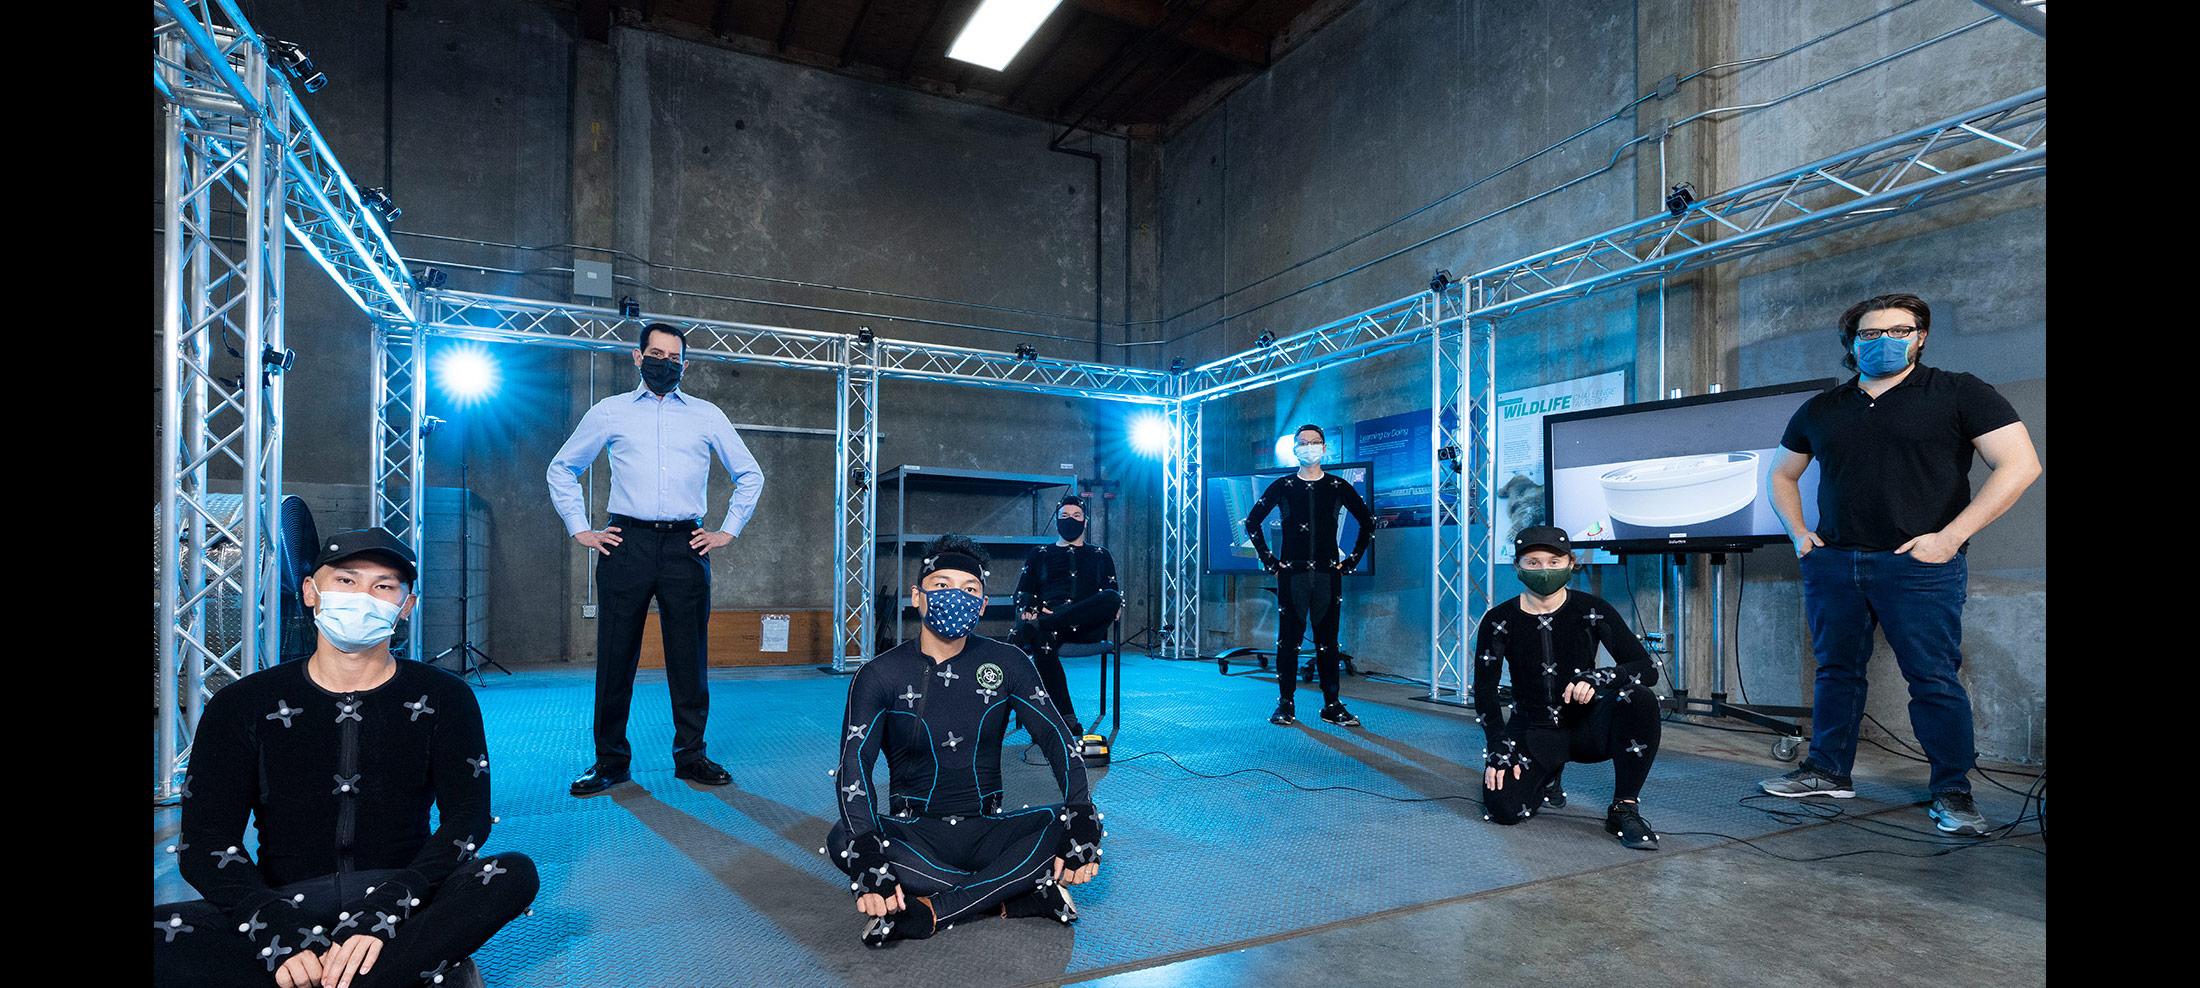 Immersive Digital Experiences Help Solve Engineering Challenges